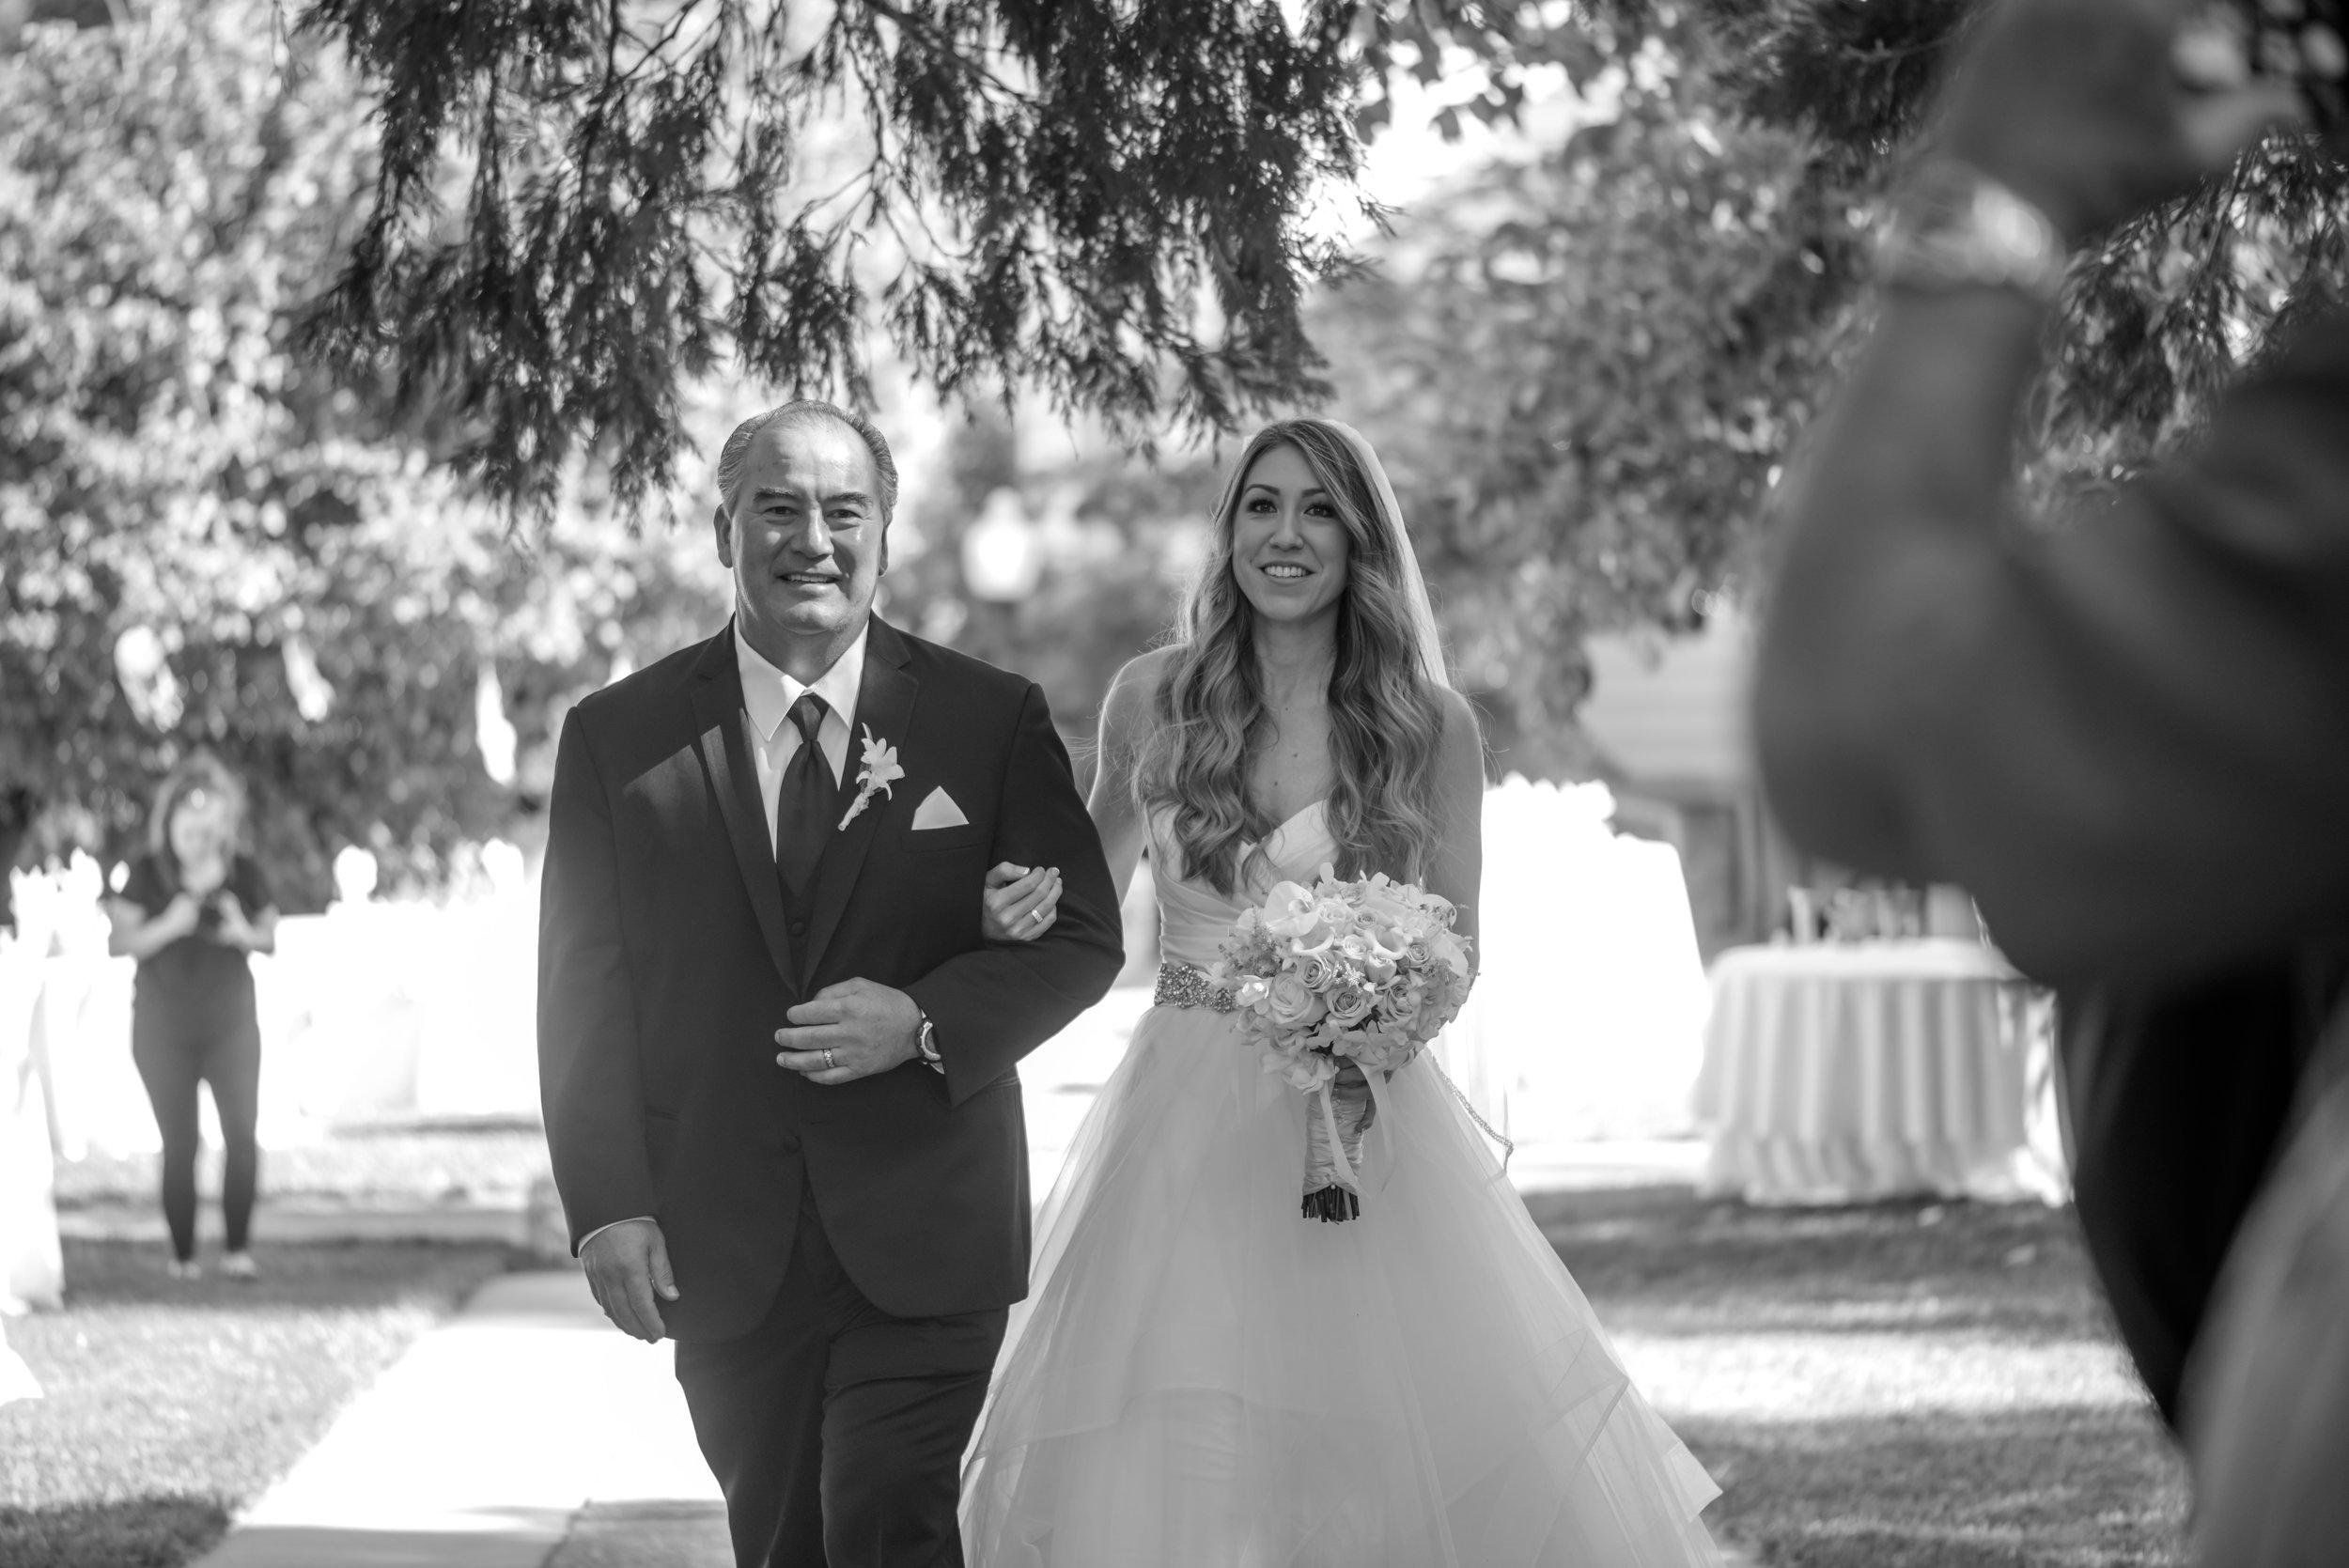 nicole-luke-017-onte-verde-inn-foresthill-wedding-photographer-katherine-nicole-photography.JPG